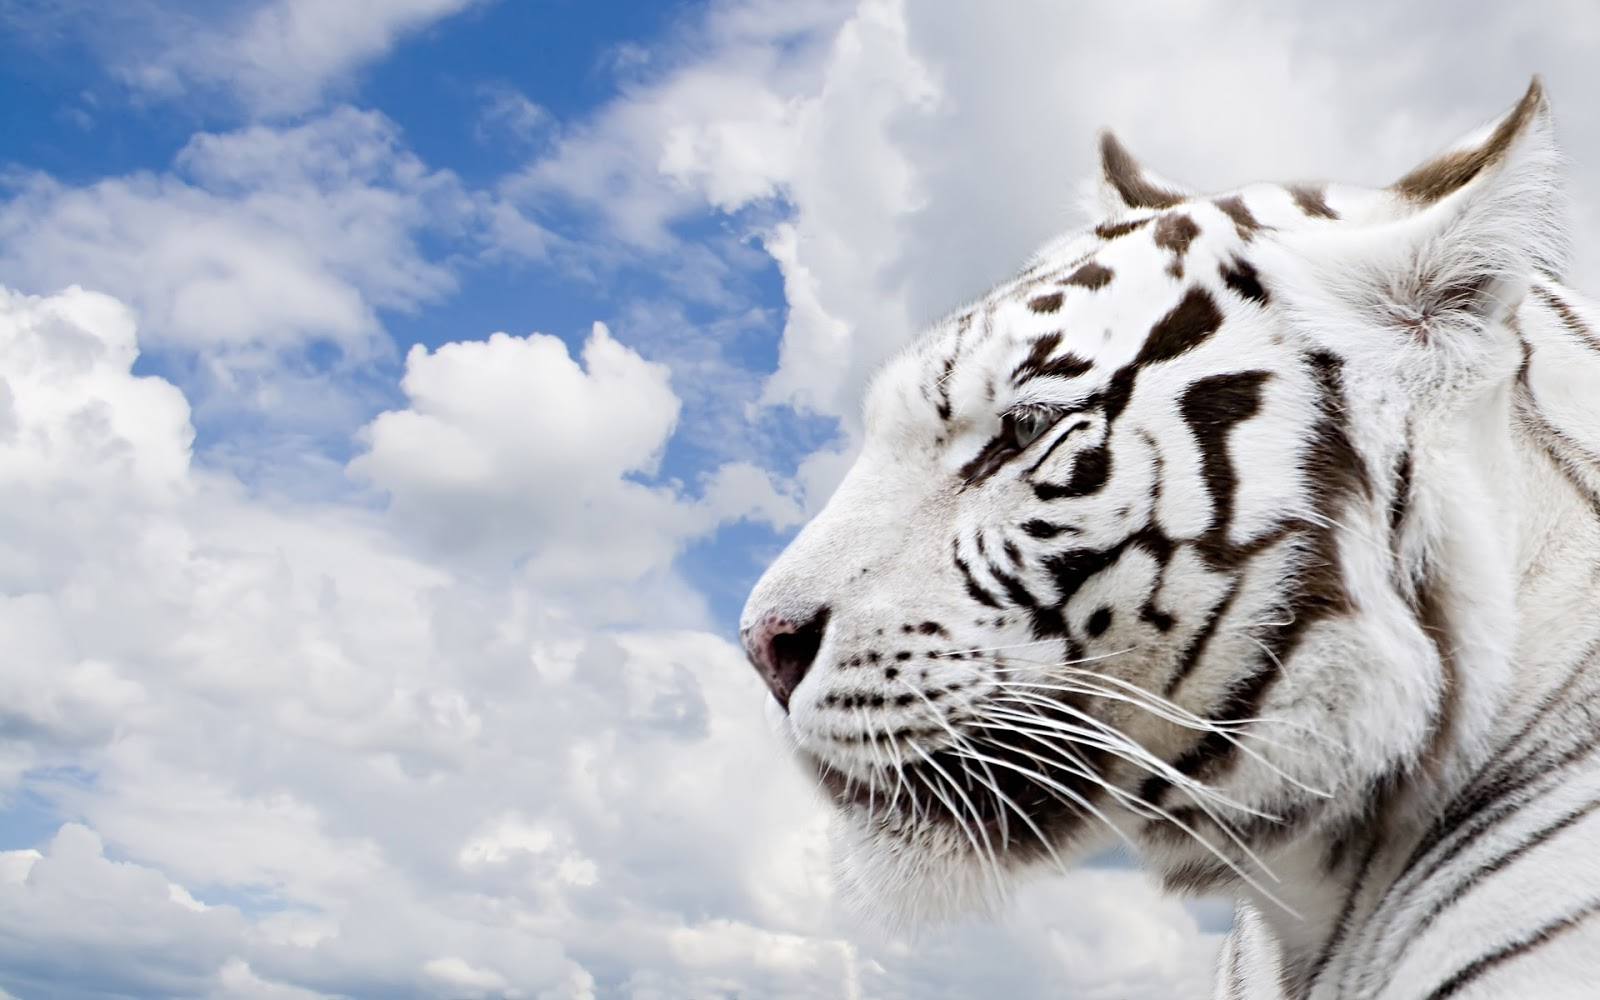 White Bengal Tigers Latest Hd Wallpaper 2013 Top hd 1600x1000